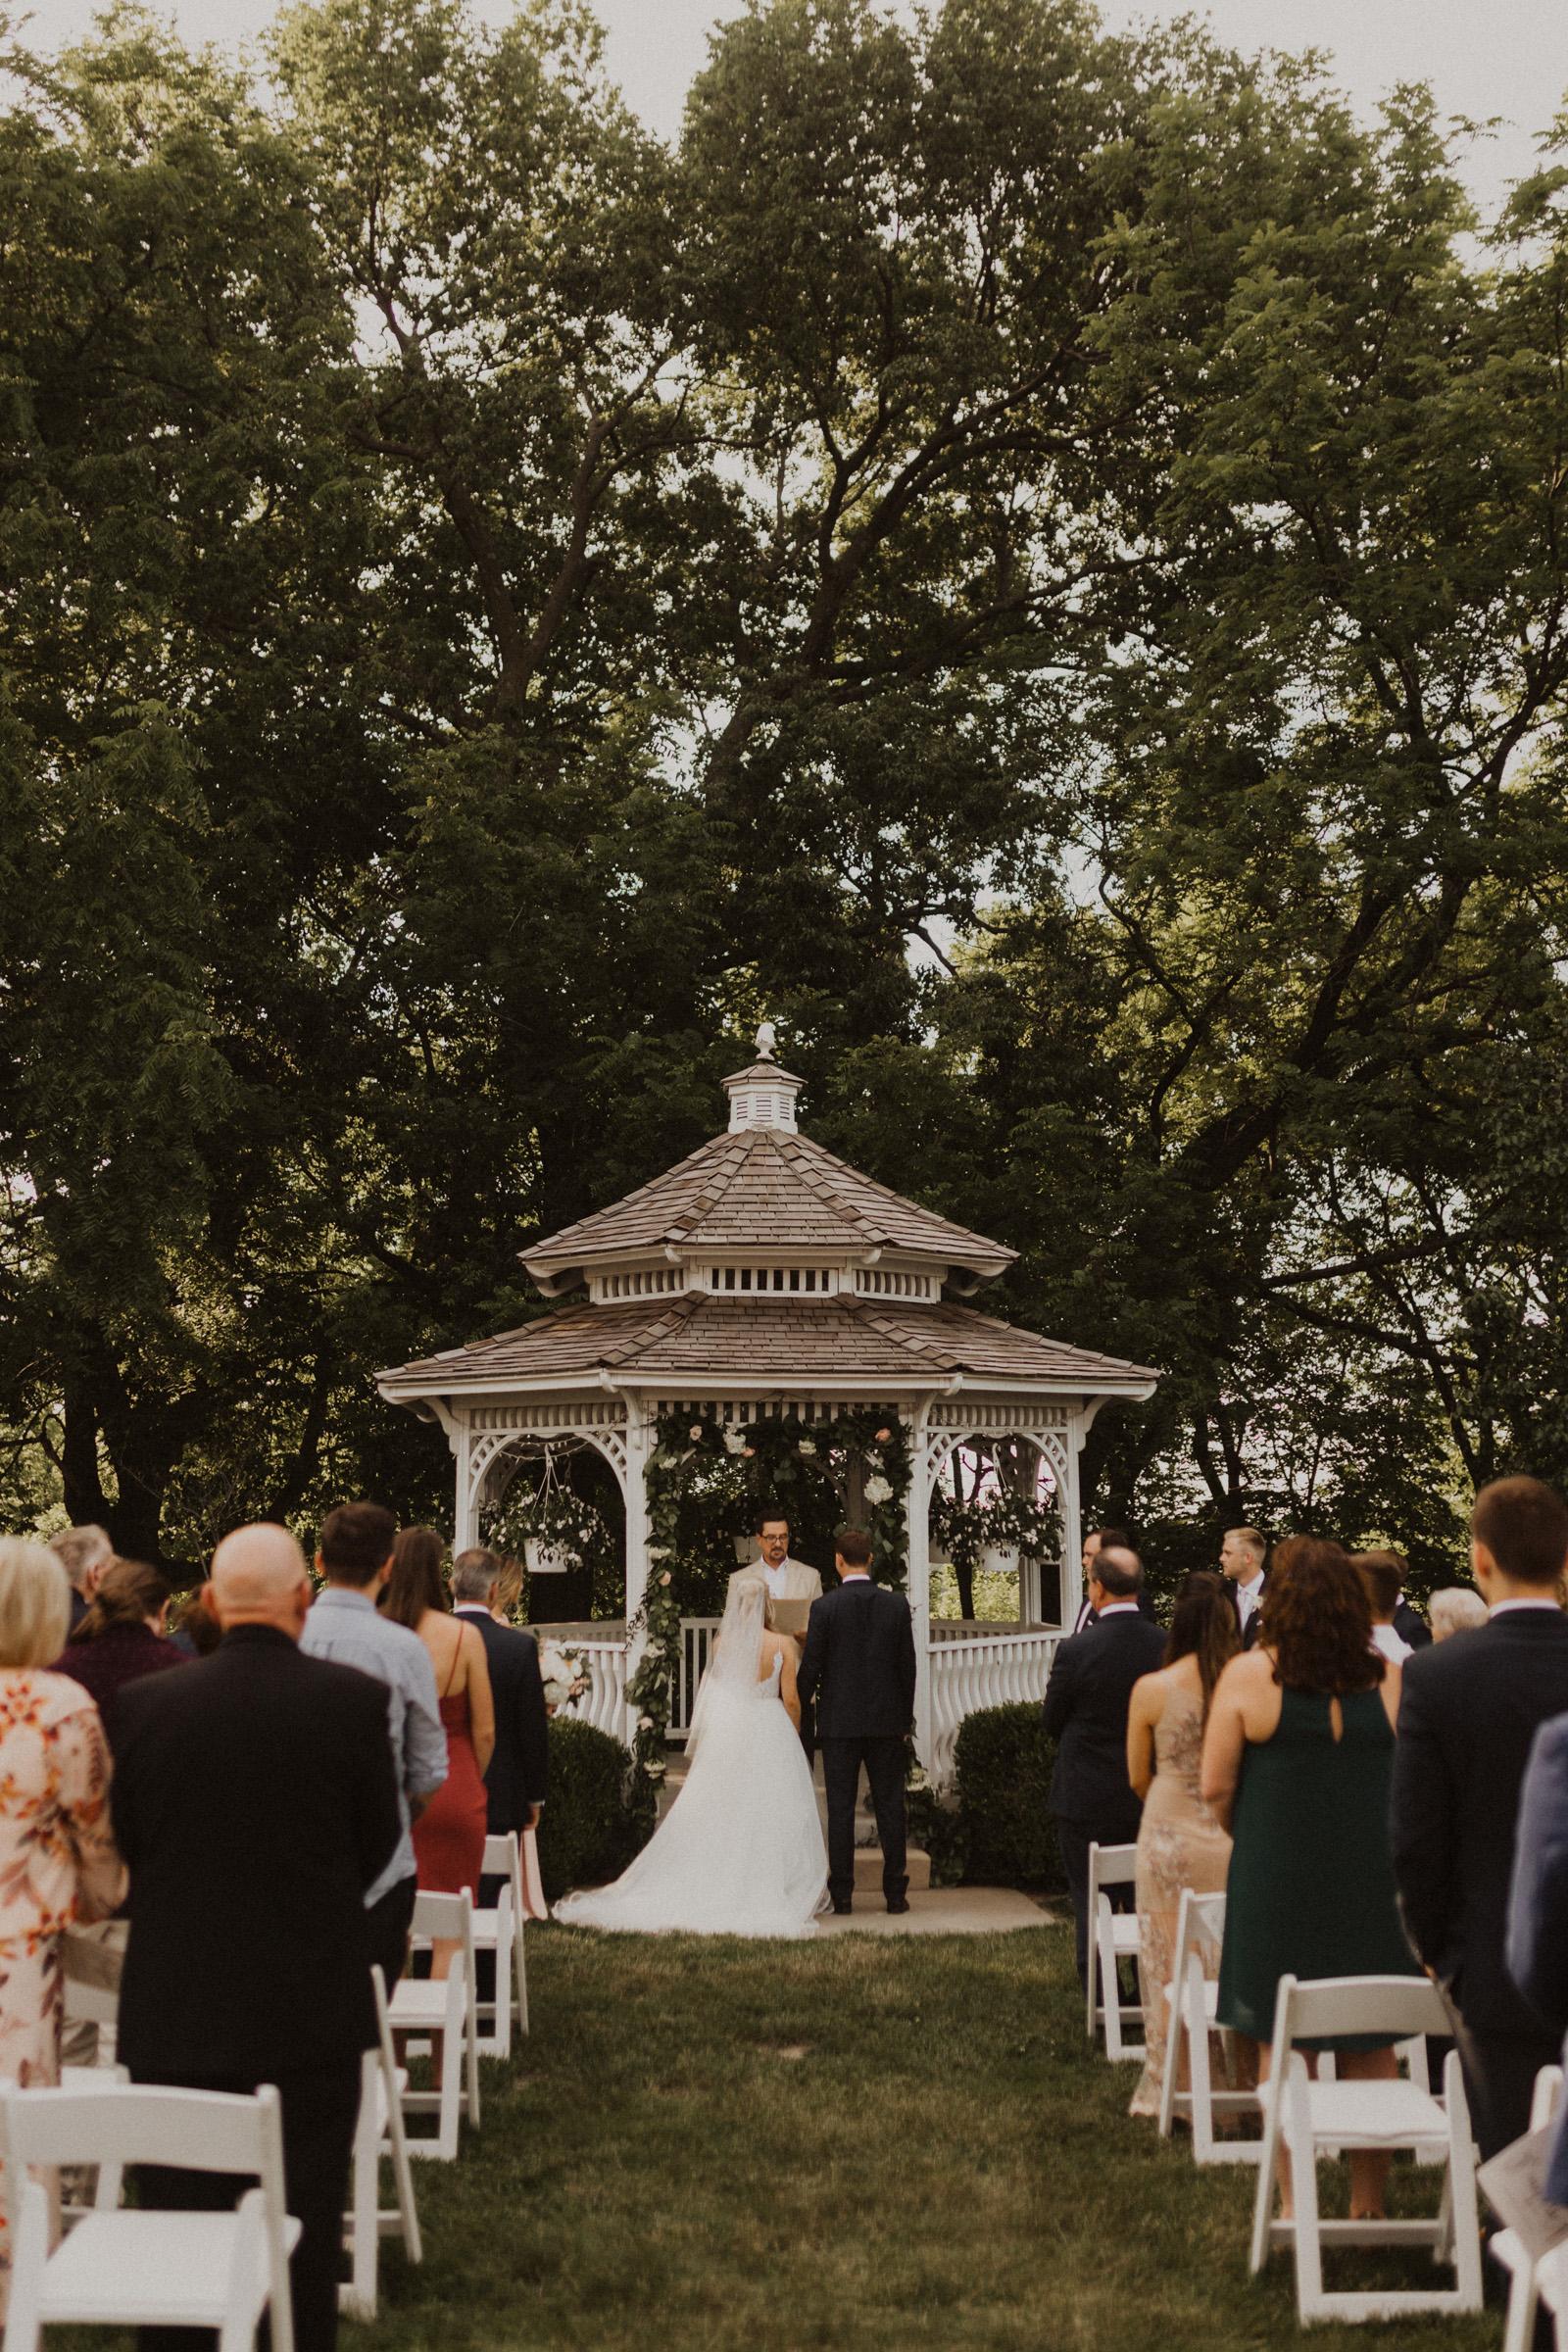 alyssa barletter photography hawthorne house summer outdoor wedding southern charm inspiration-46.jpg